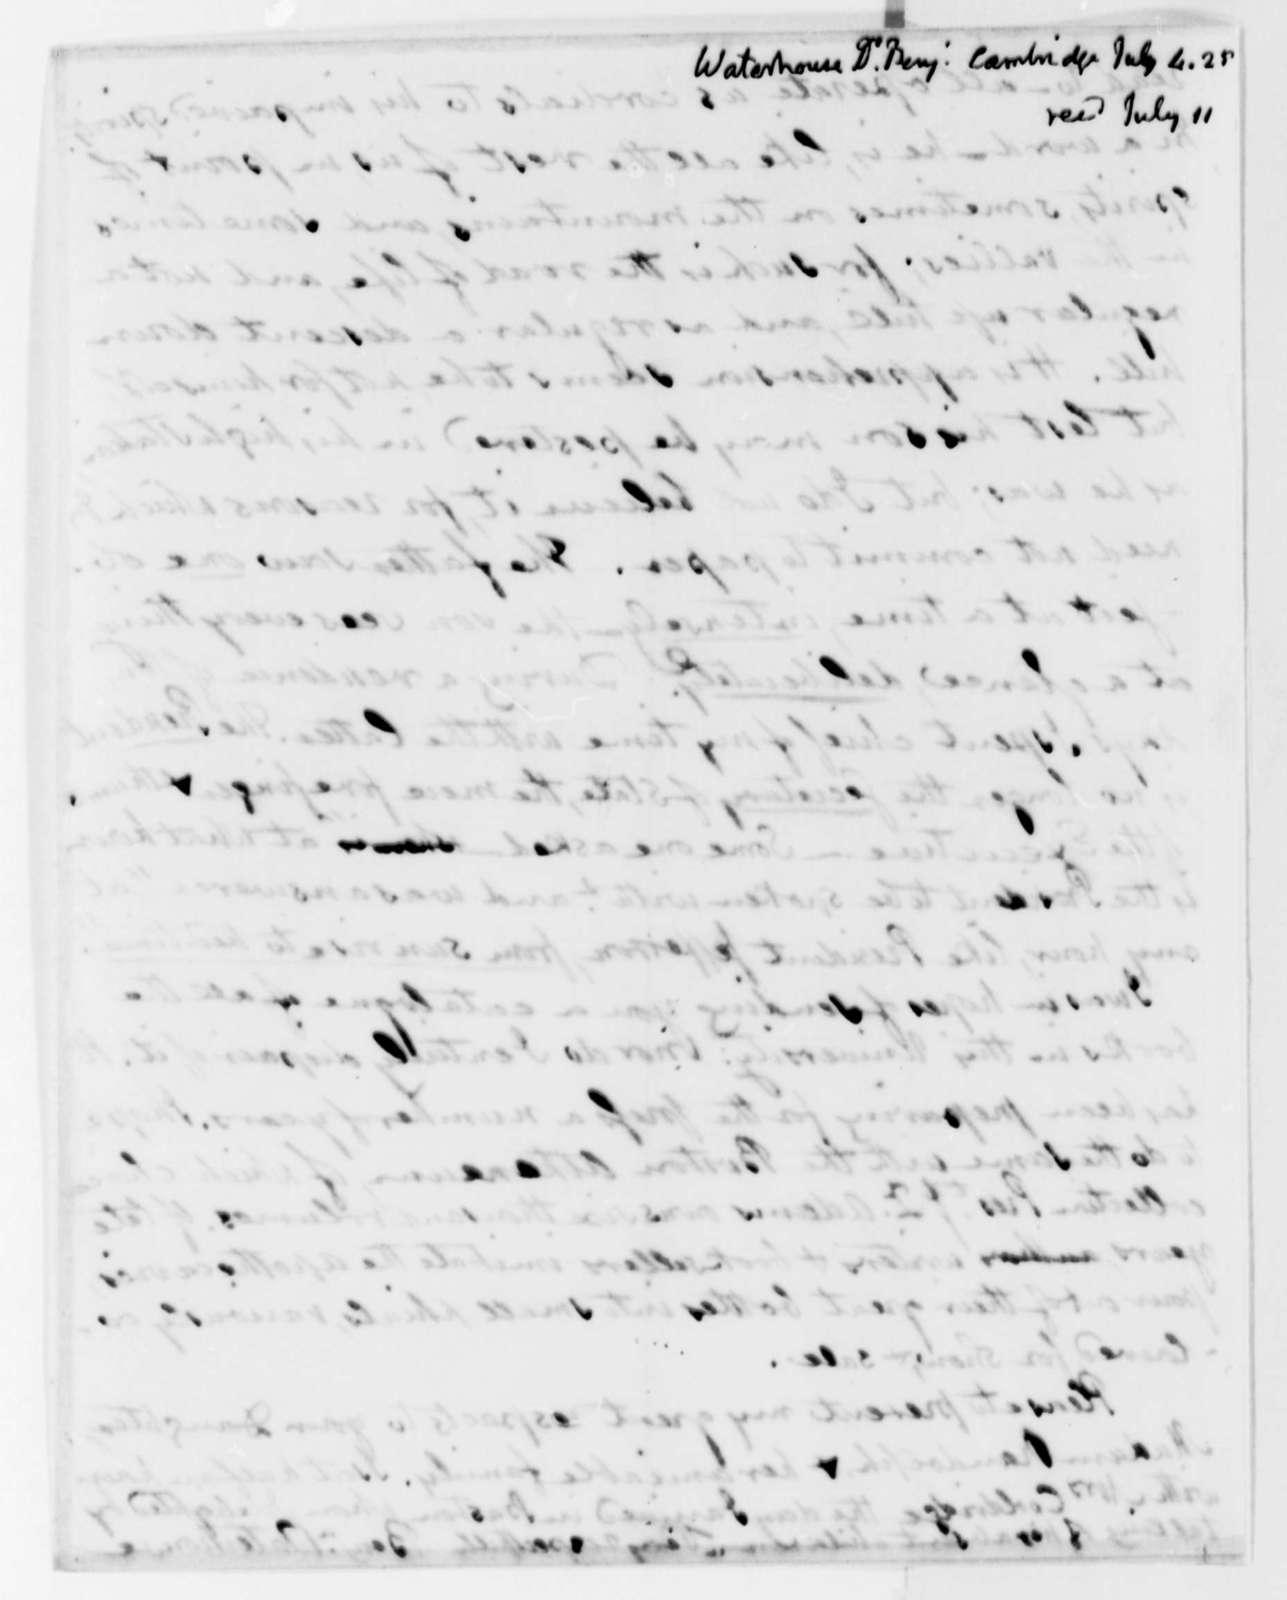 Benjamin Waterhouse to Thomas Jefferson, July 4, 1825